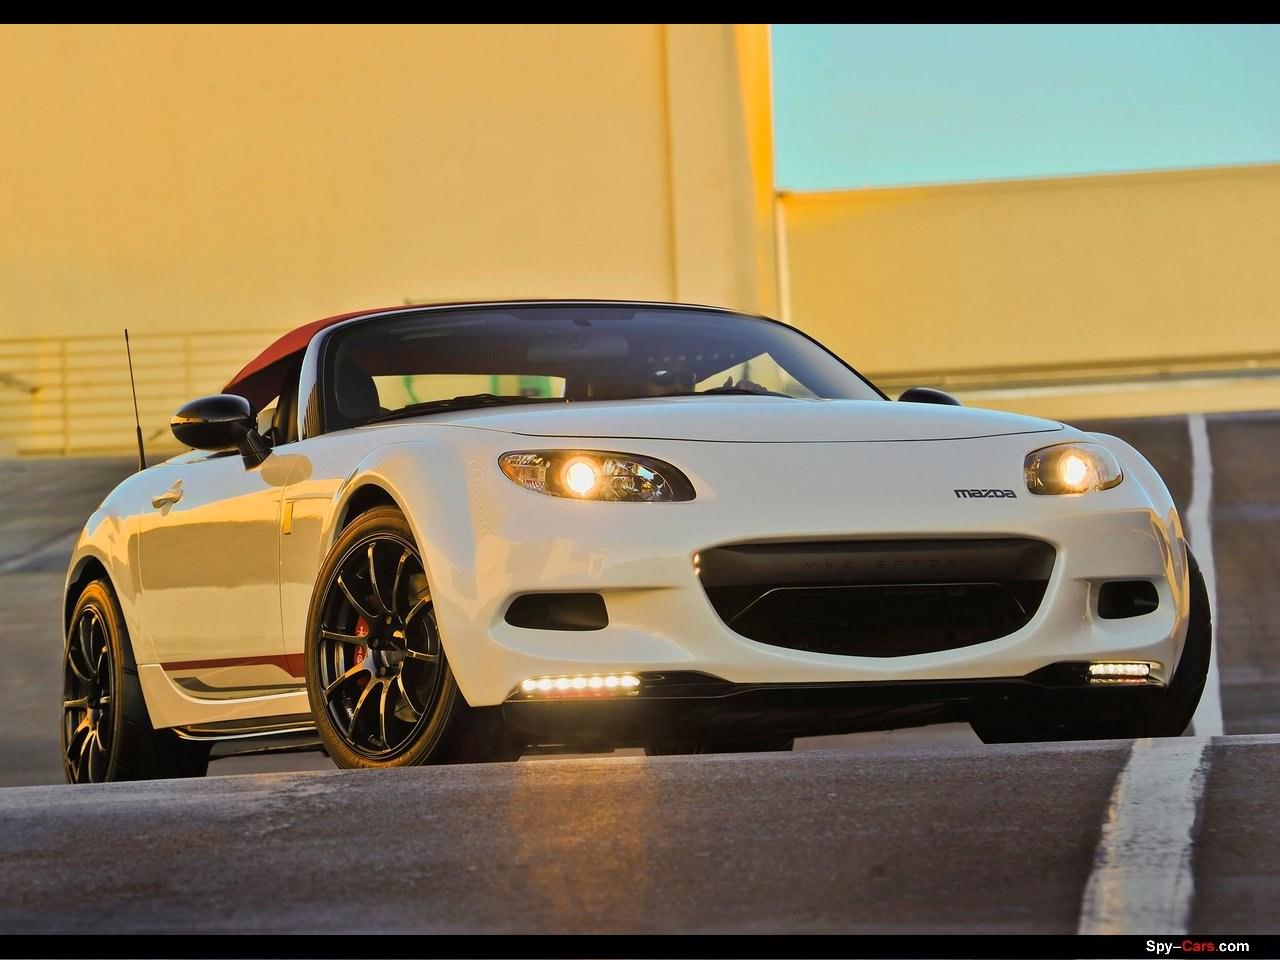 http://2.bp.blogspot.com/-n_JueCTEk0I/TrO8wj9S-yI/AAAAAAACRWQ/gxyCJf1CnOI/s1600/Mazda-MX-5_Spyder_Concept_2011_001.jpg